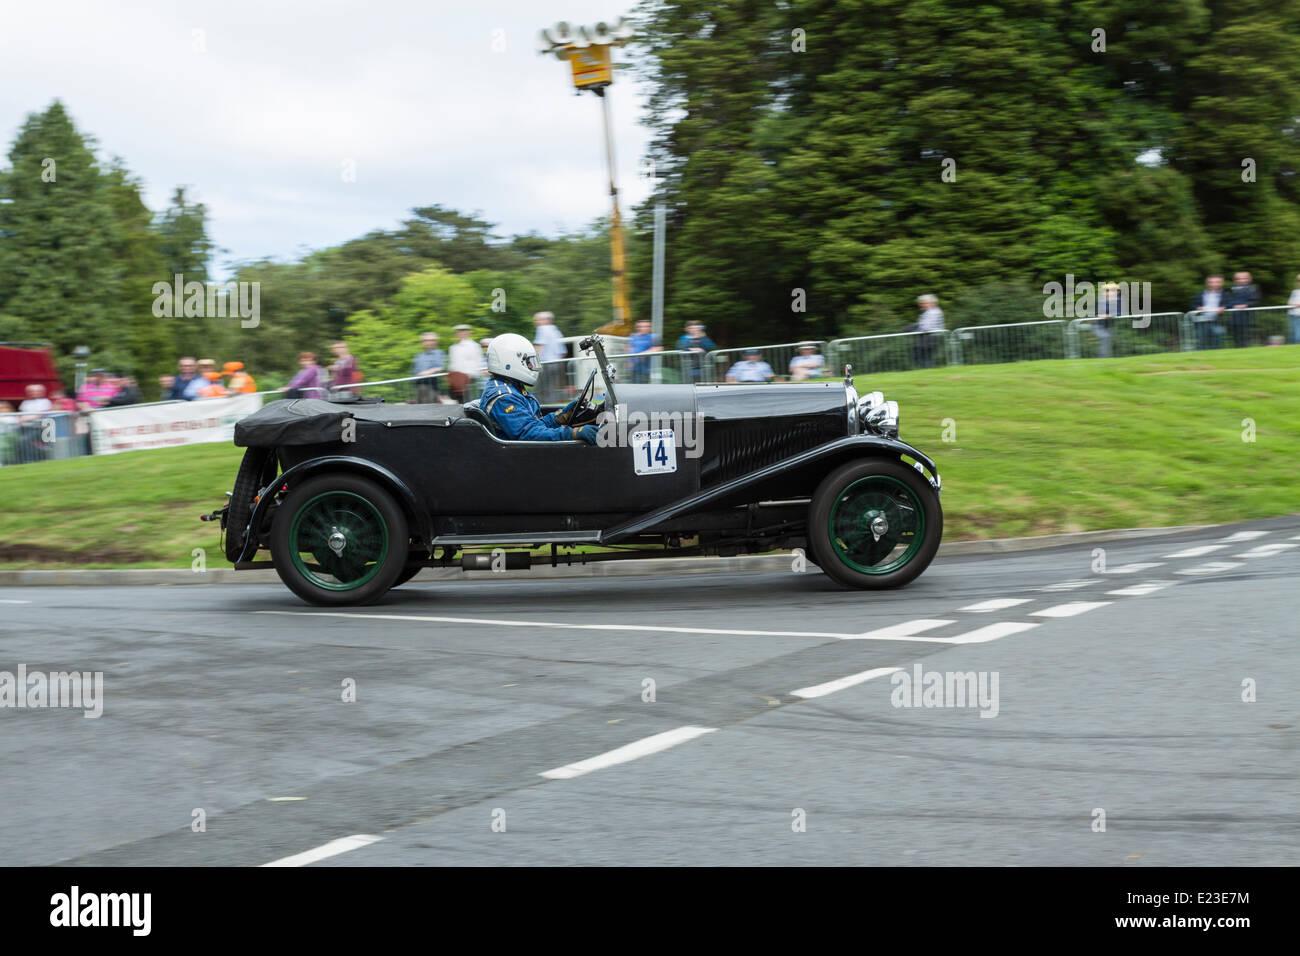 Cultra, Holywood, Northern Ireland. 14 June 2014. Cultra Hillclimb. 1928 Lagonda HC Sports, Roger Corry. Credit: - Stock Image